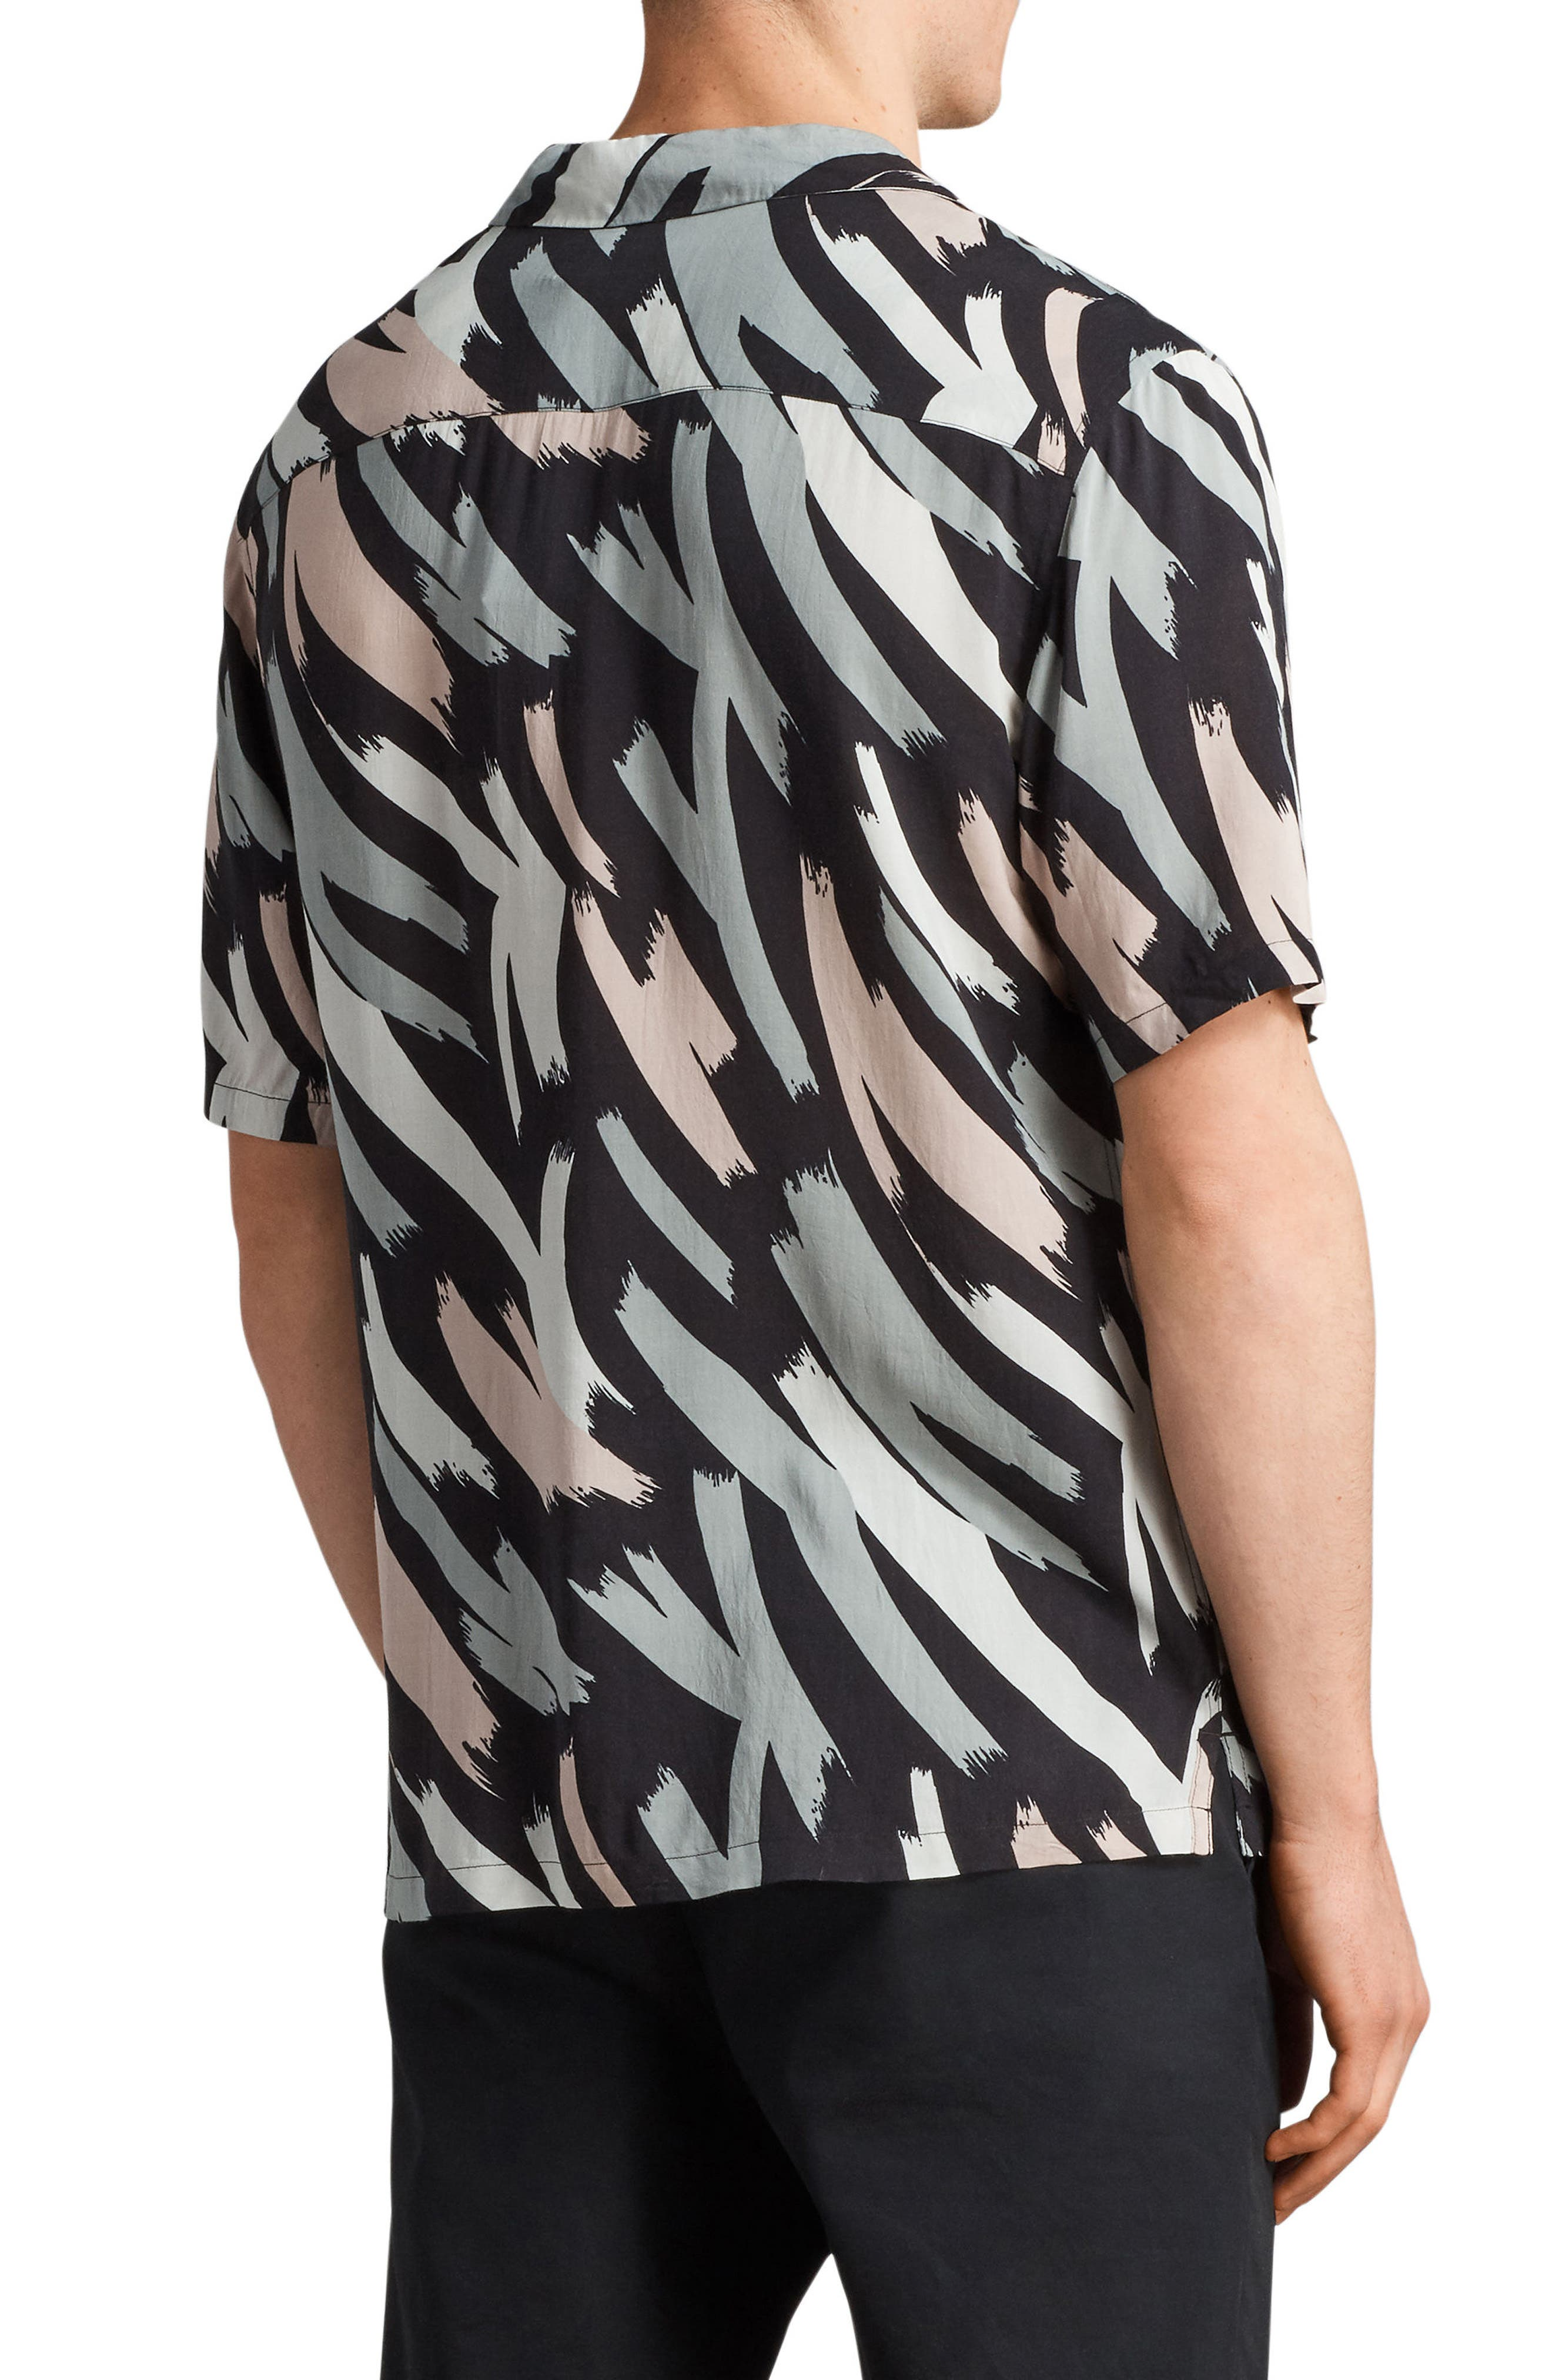 Koloa Slim Fit Short Sleeve Sport Shirt,                             Alternate thumbnail 2, color,                             008